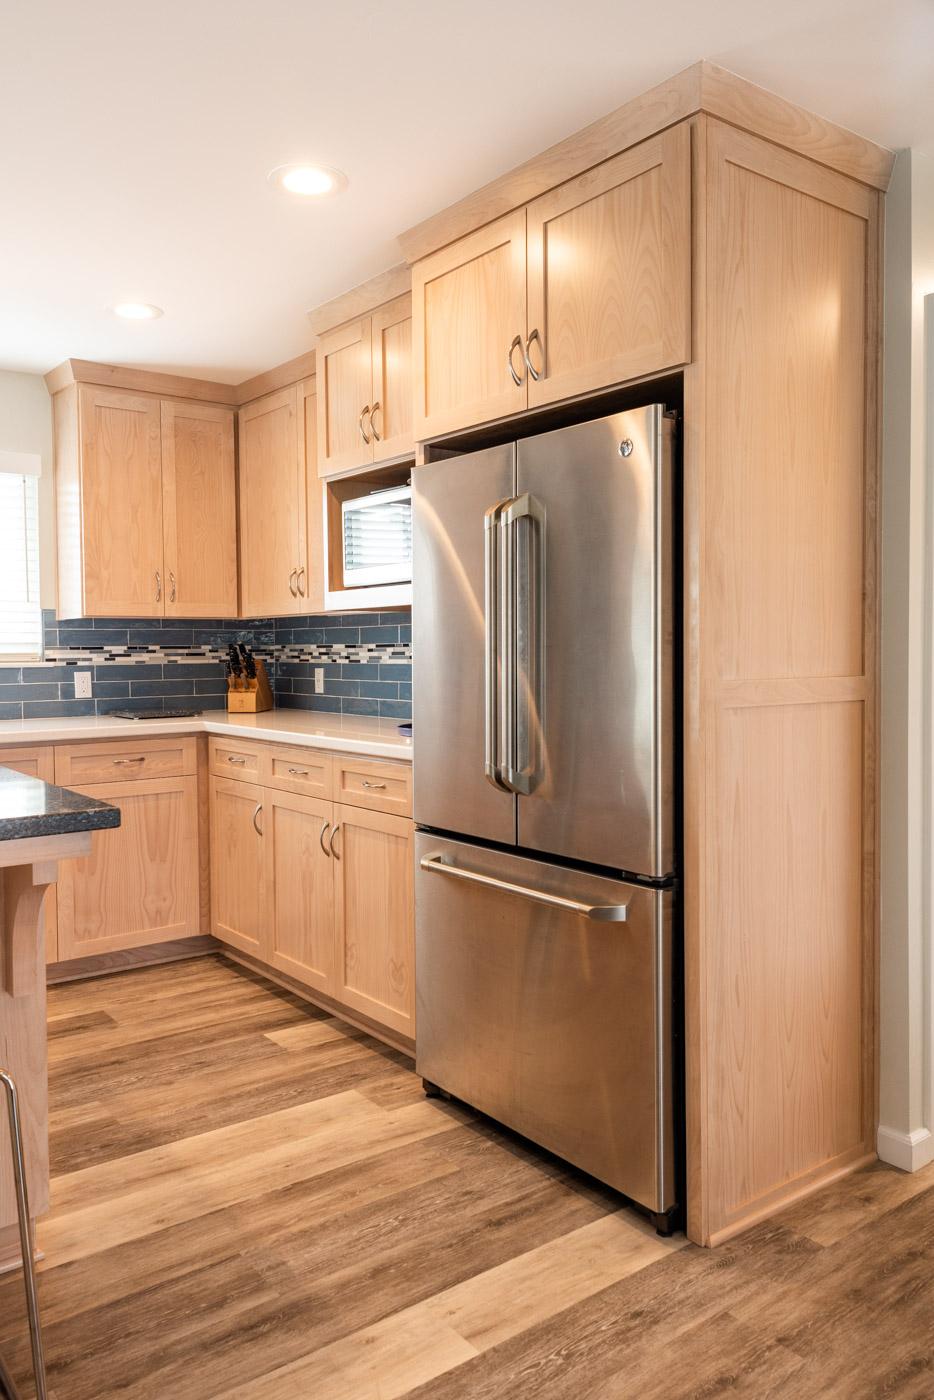 Sligh Cabinets Custom Kitchen Design Morro Bay-9.jpg